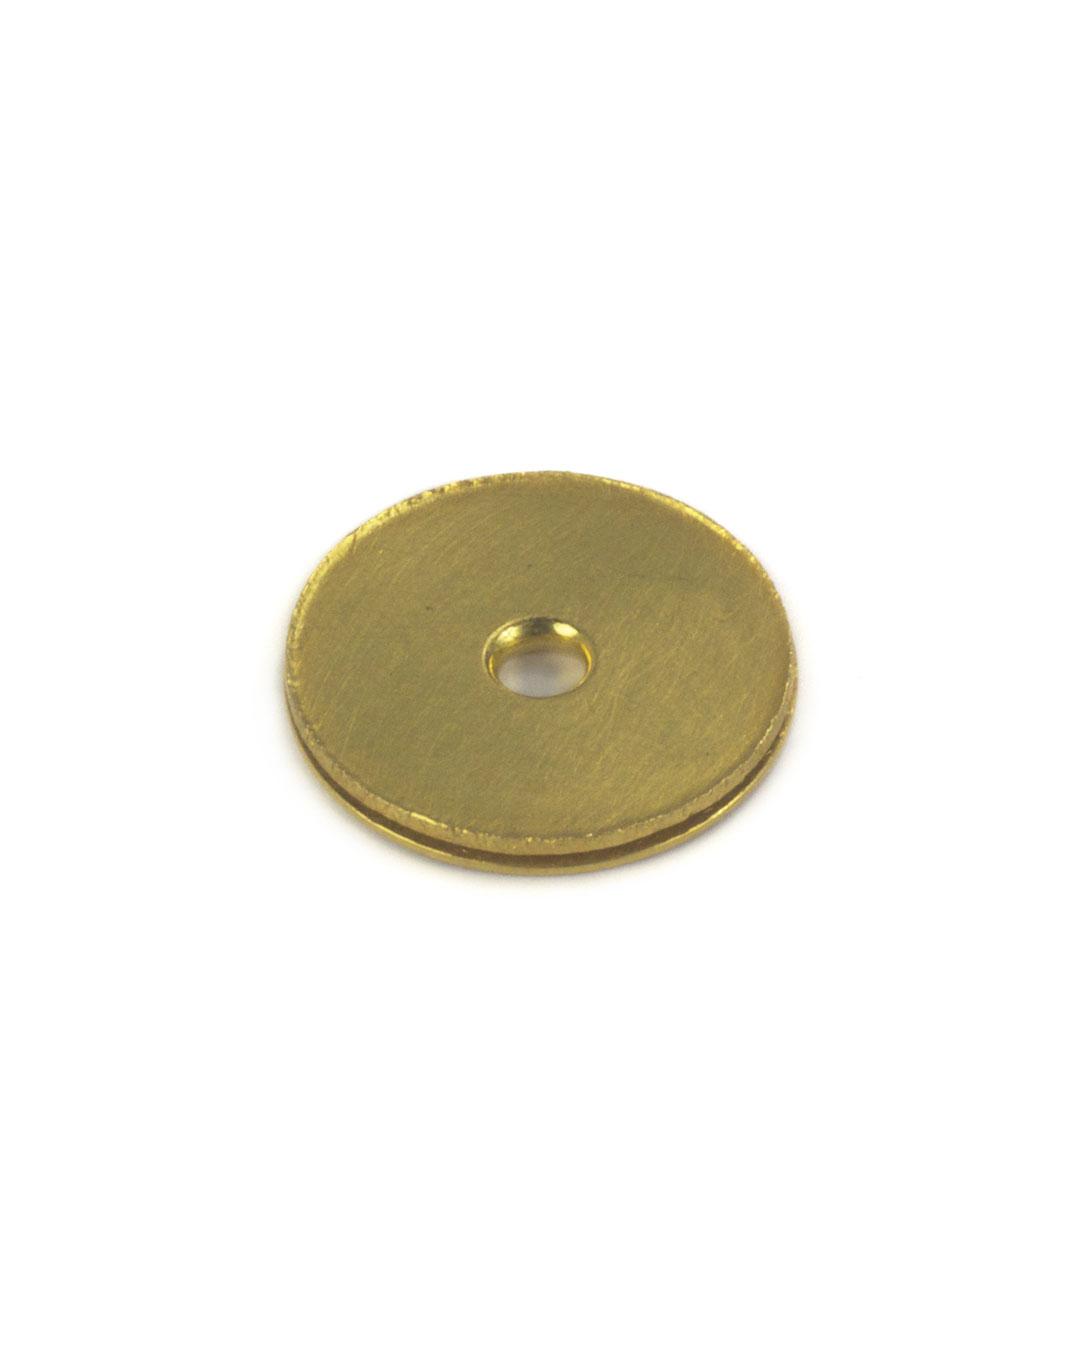 Okinari Kurokawa, untitled, 2002, pendant; 20ct gold, ø 31 x 3 mm, €1450